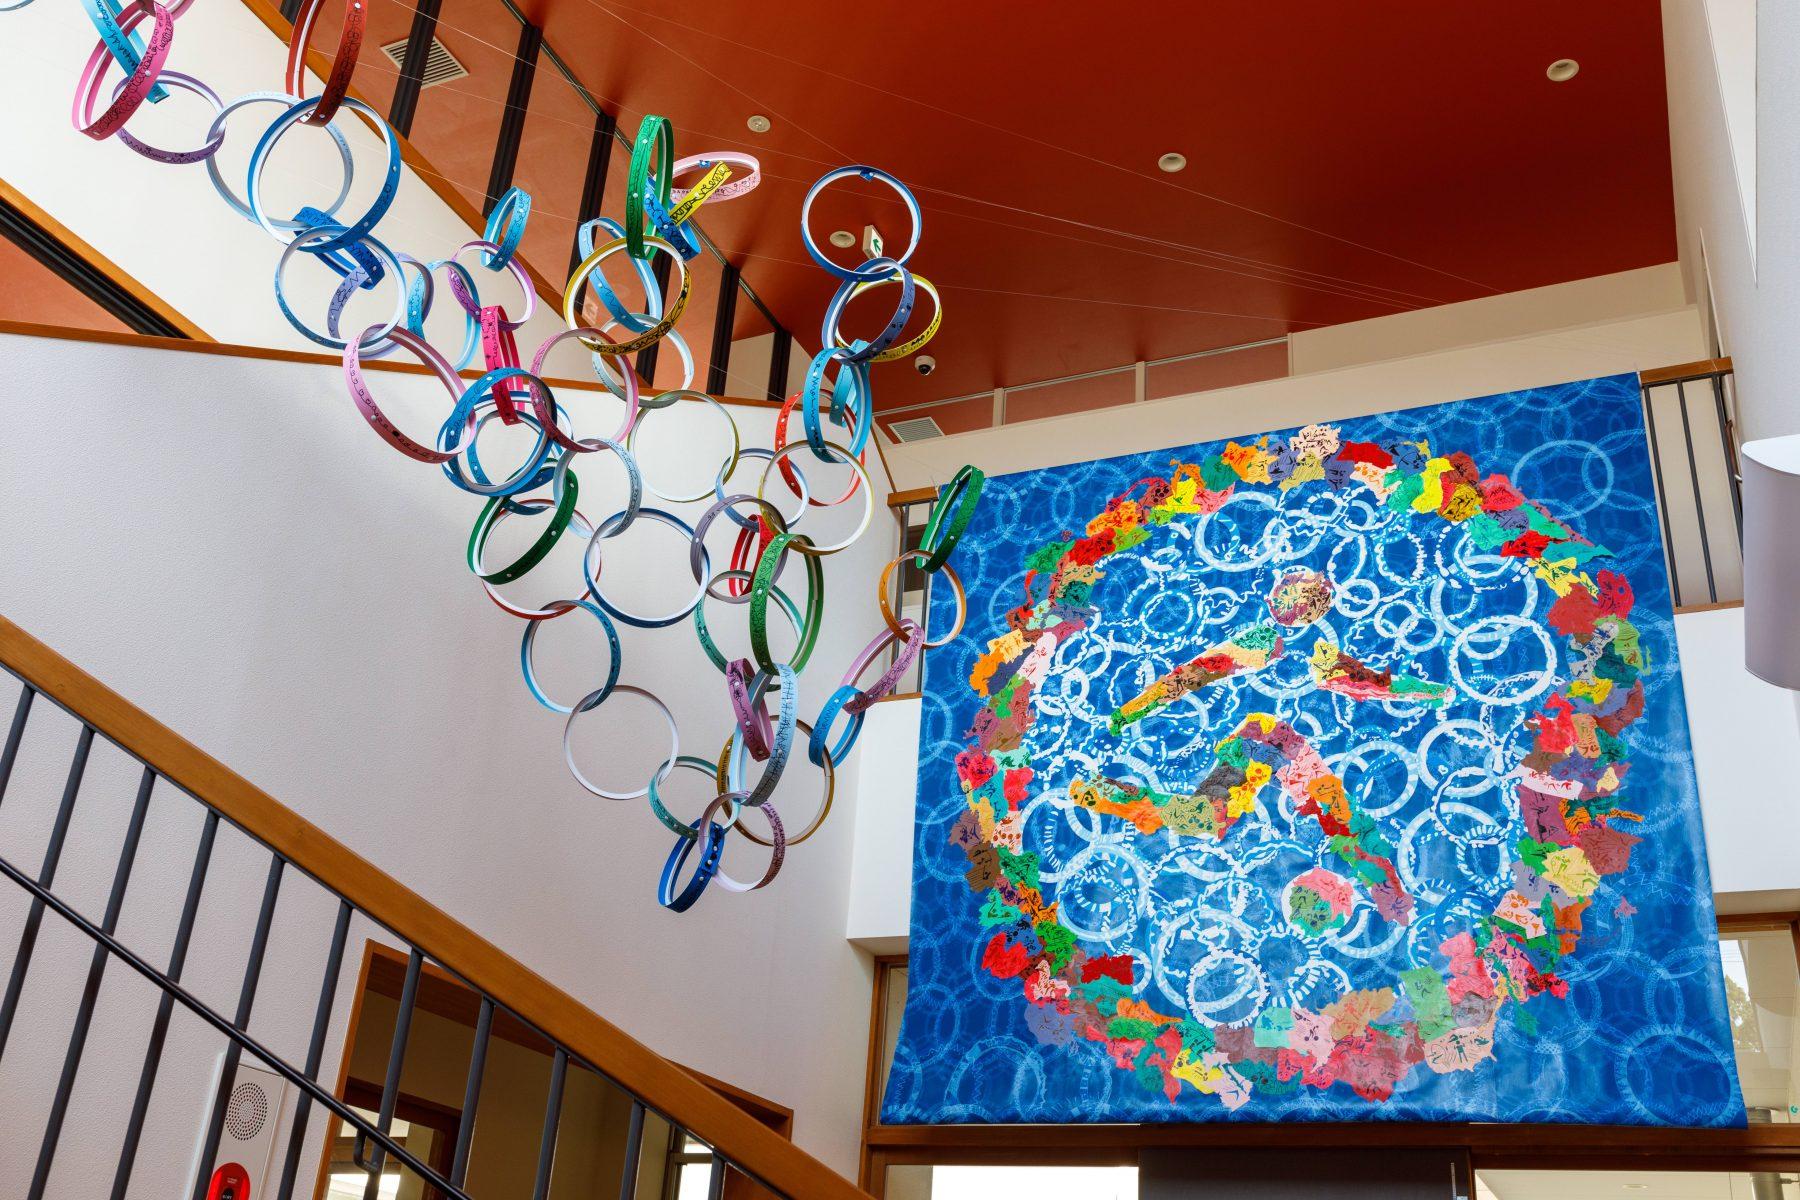 Arts Exchange Completed artwork installed at the Lumbini Kindergarten in Saiki City